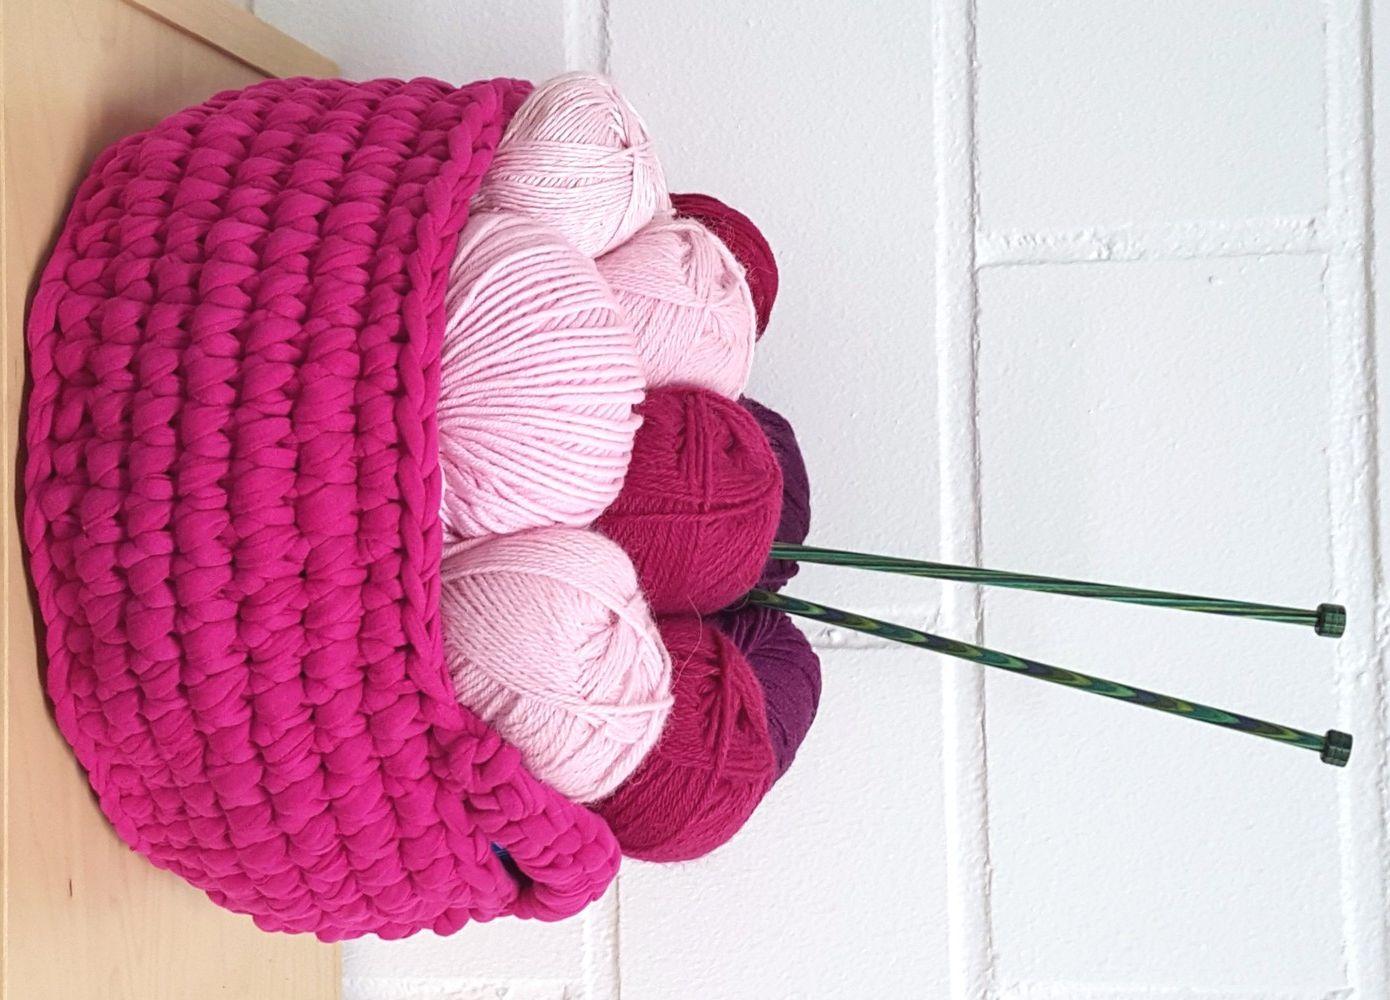 TRI100 ilmainen ohje www.tekstiiliteollisuus.fi  gratis mönster www.teeteegarn.com